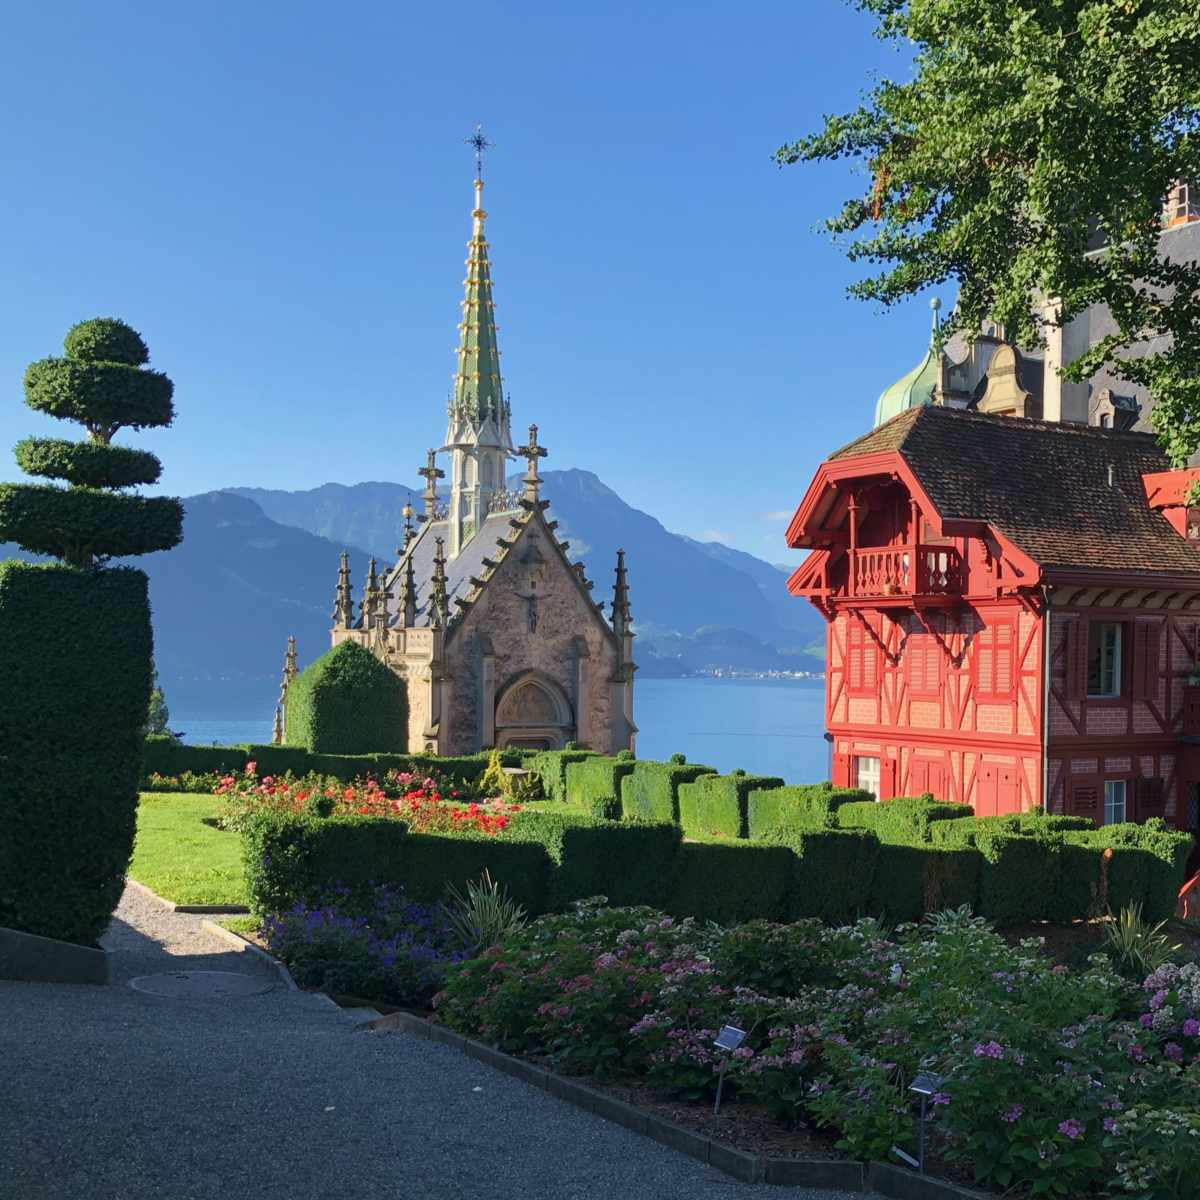 Kapelle in Meggen am Vierwaldstättersee